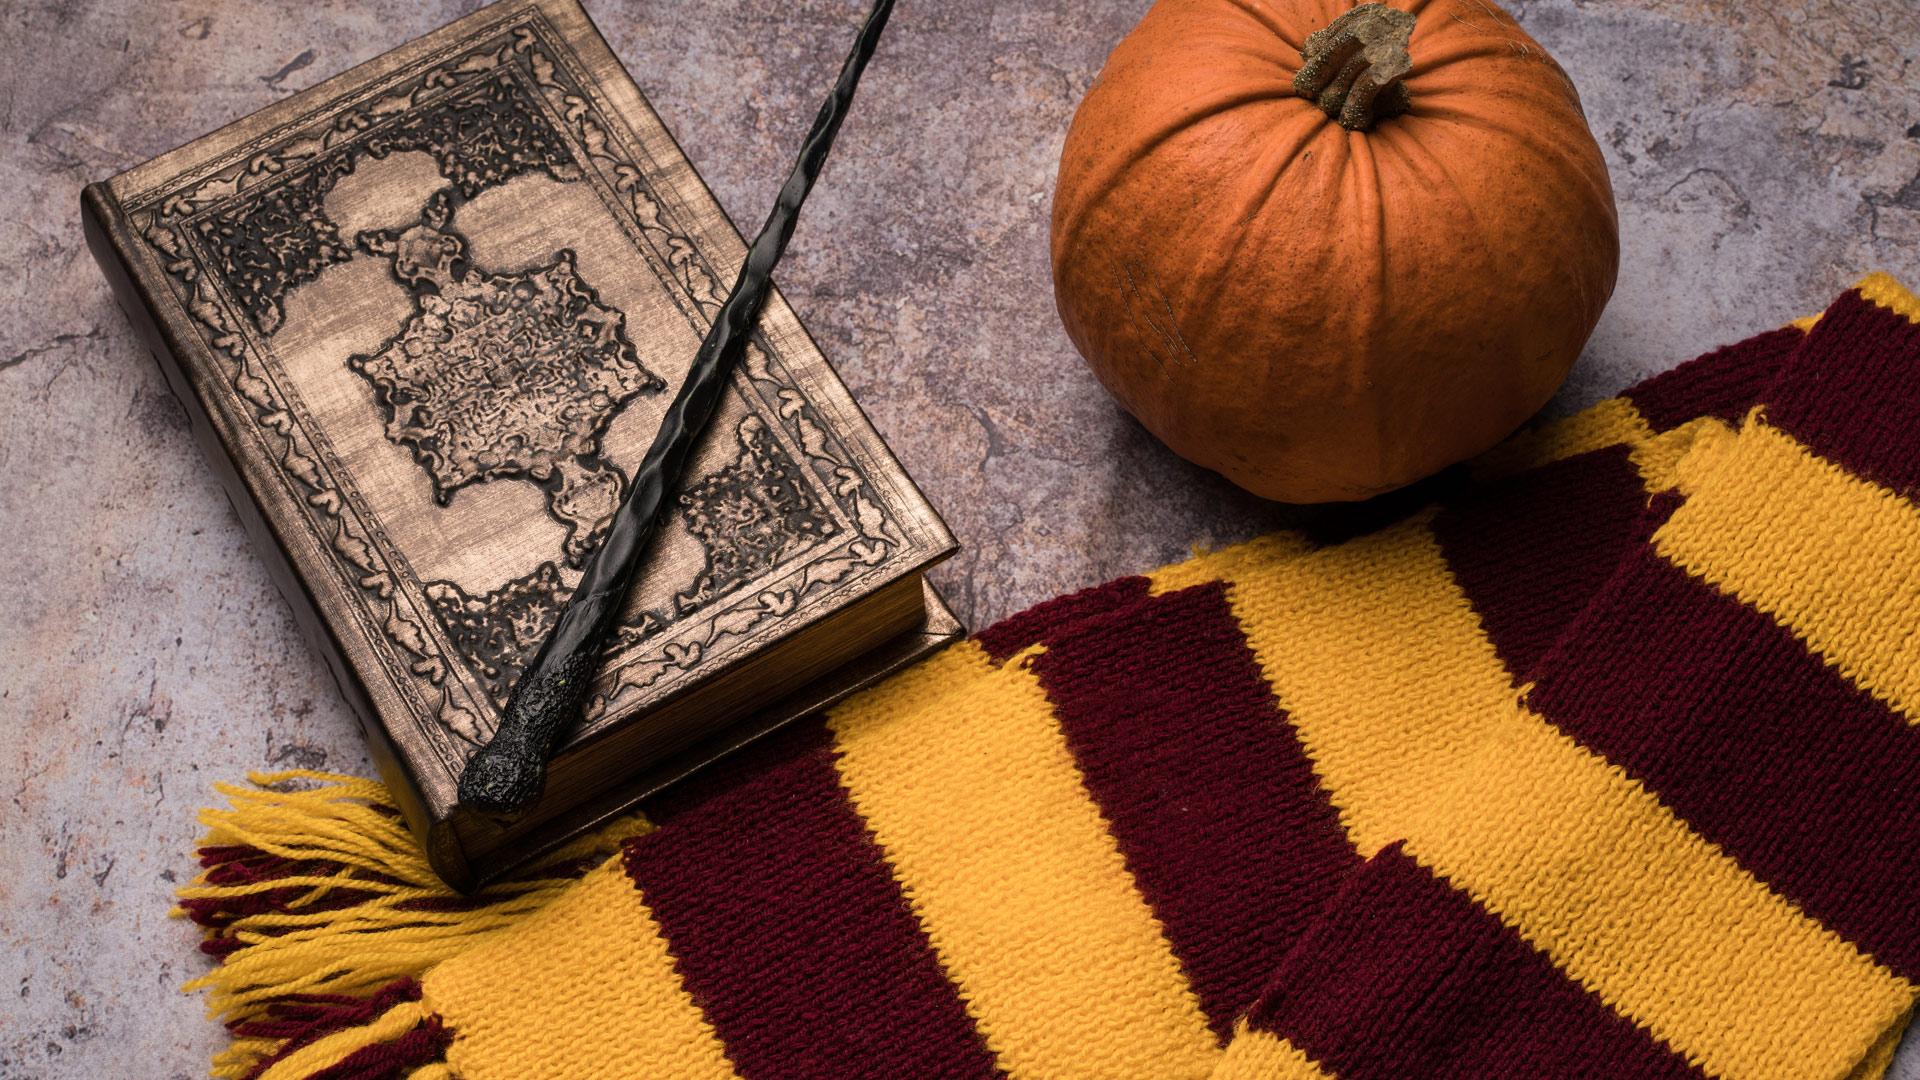 Scarf, wand, spellbook